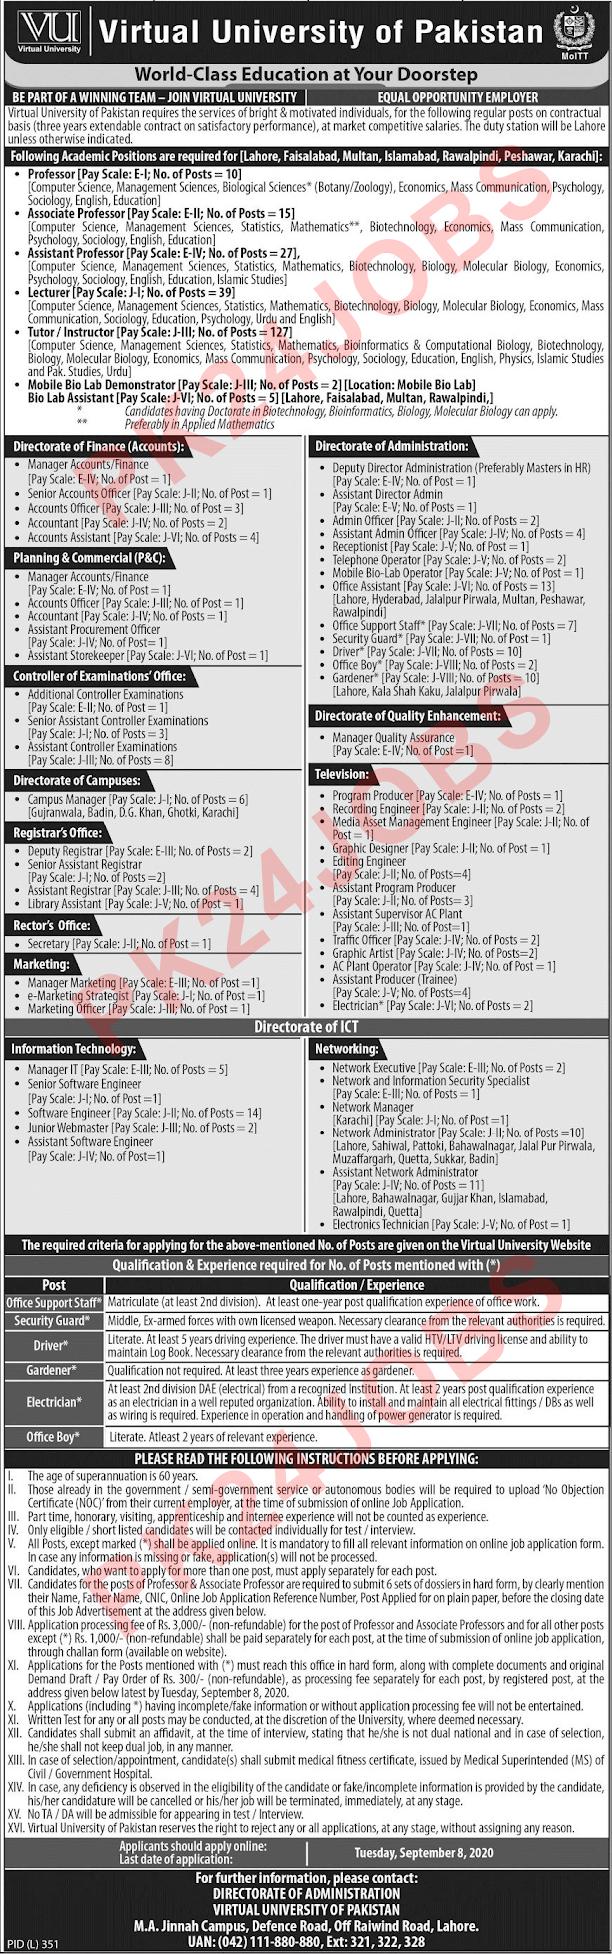 Virtual University Jobs 10 Aug 2020